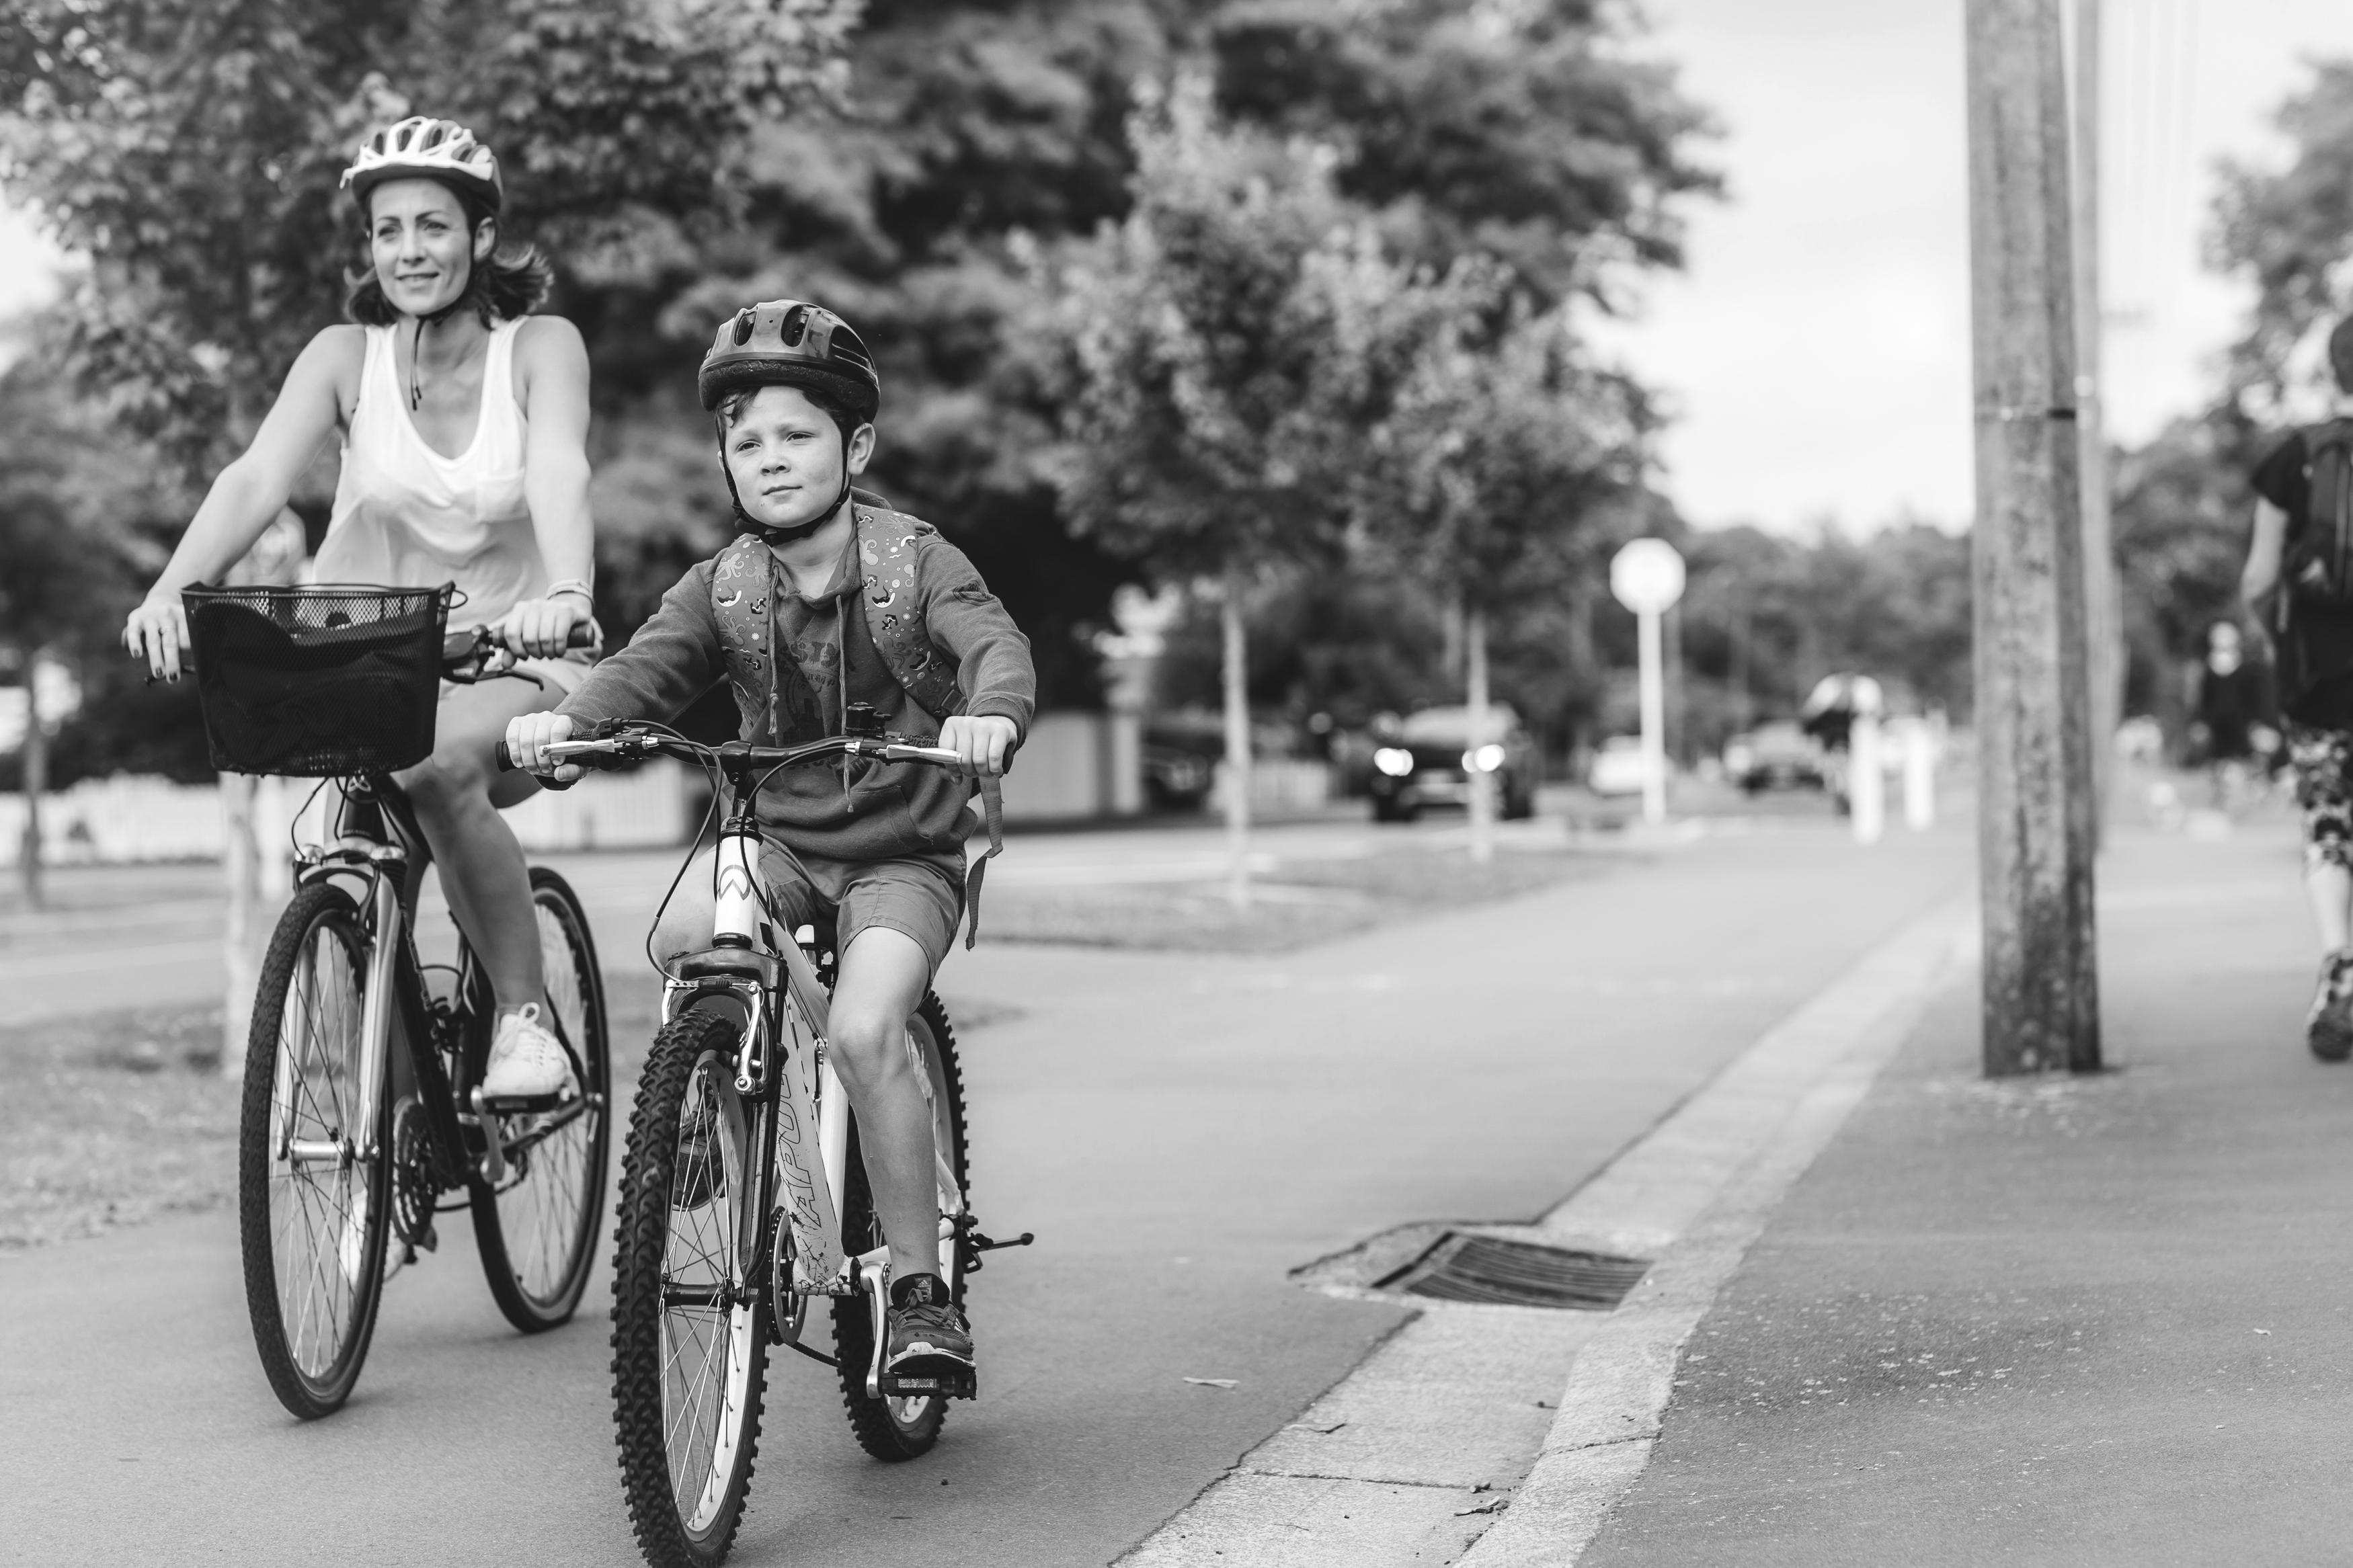 Bike as a family